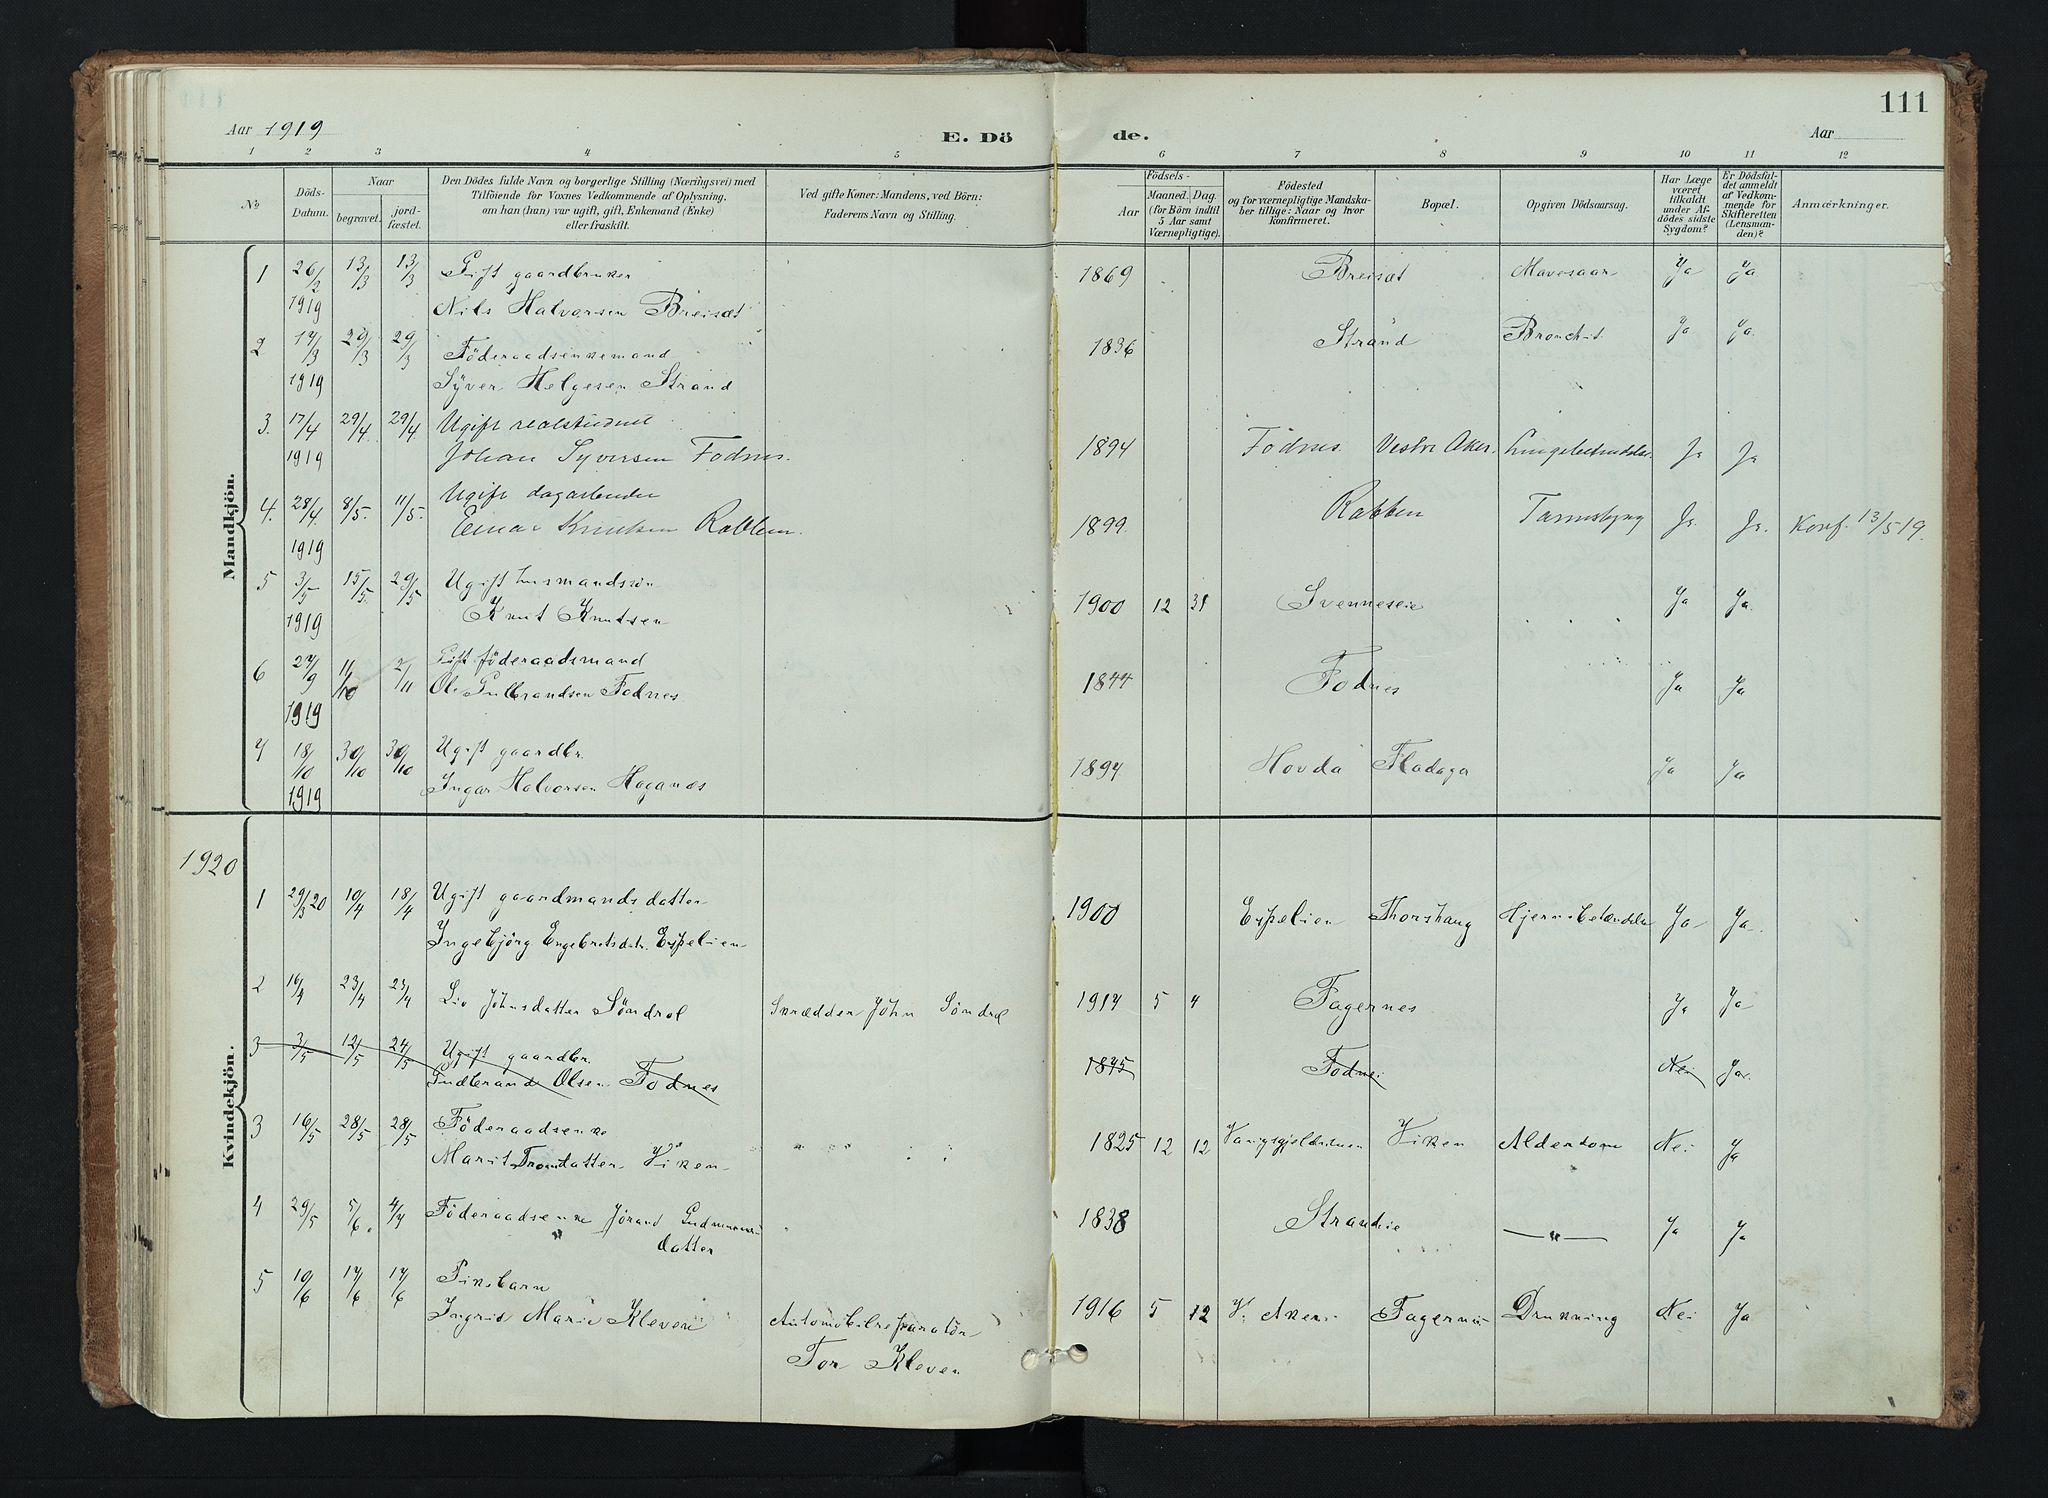 SAH, Nord-Aurdal prestekontor, Ministerialbok nr. 16, 1897-1925, s. 111